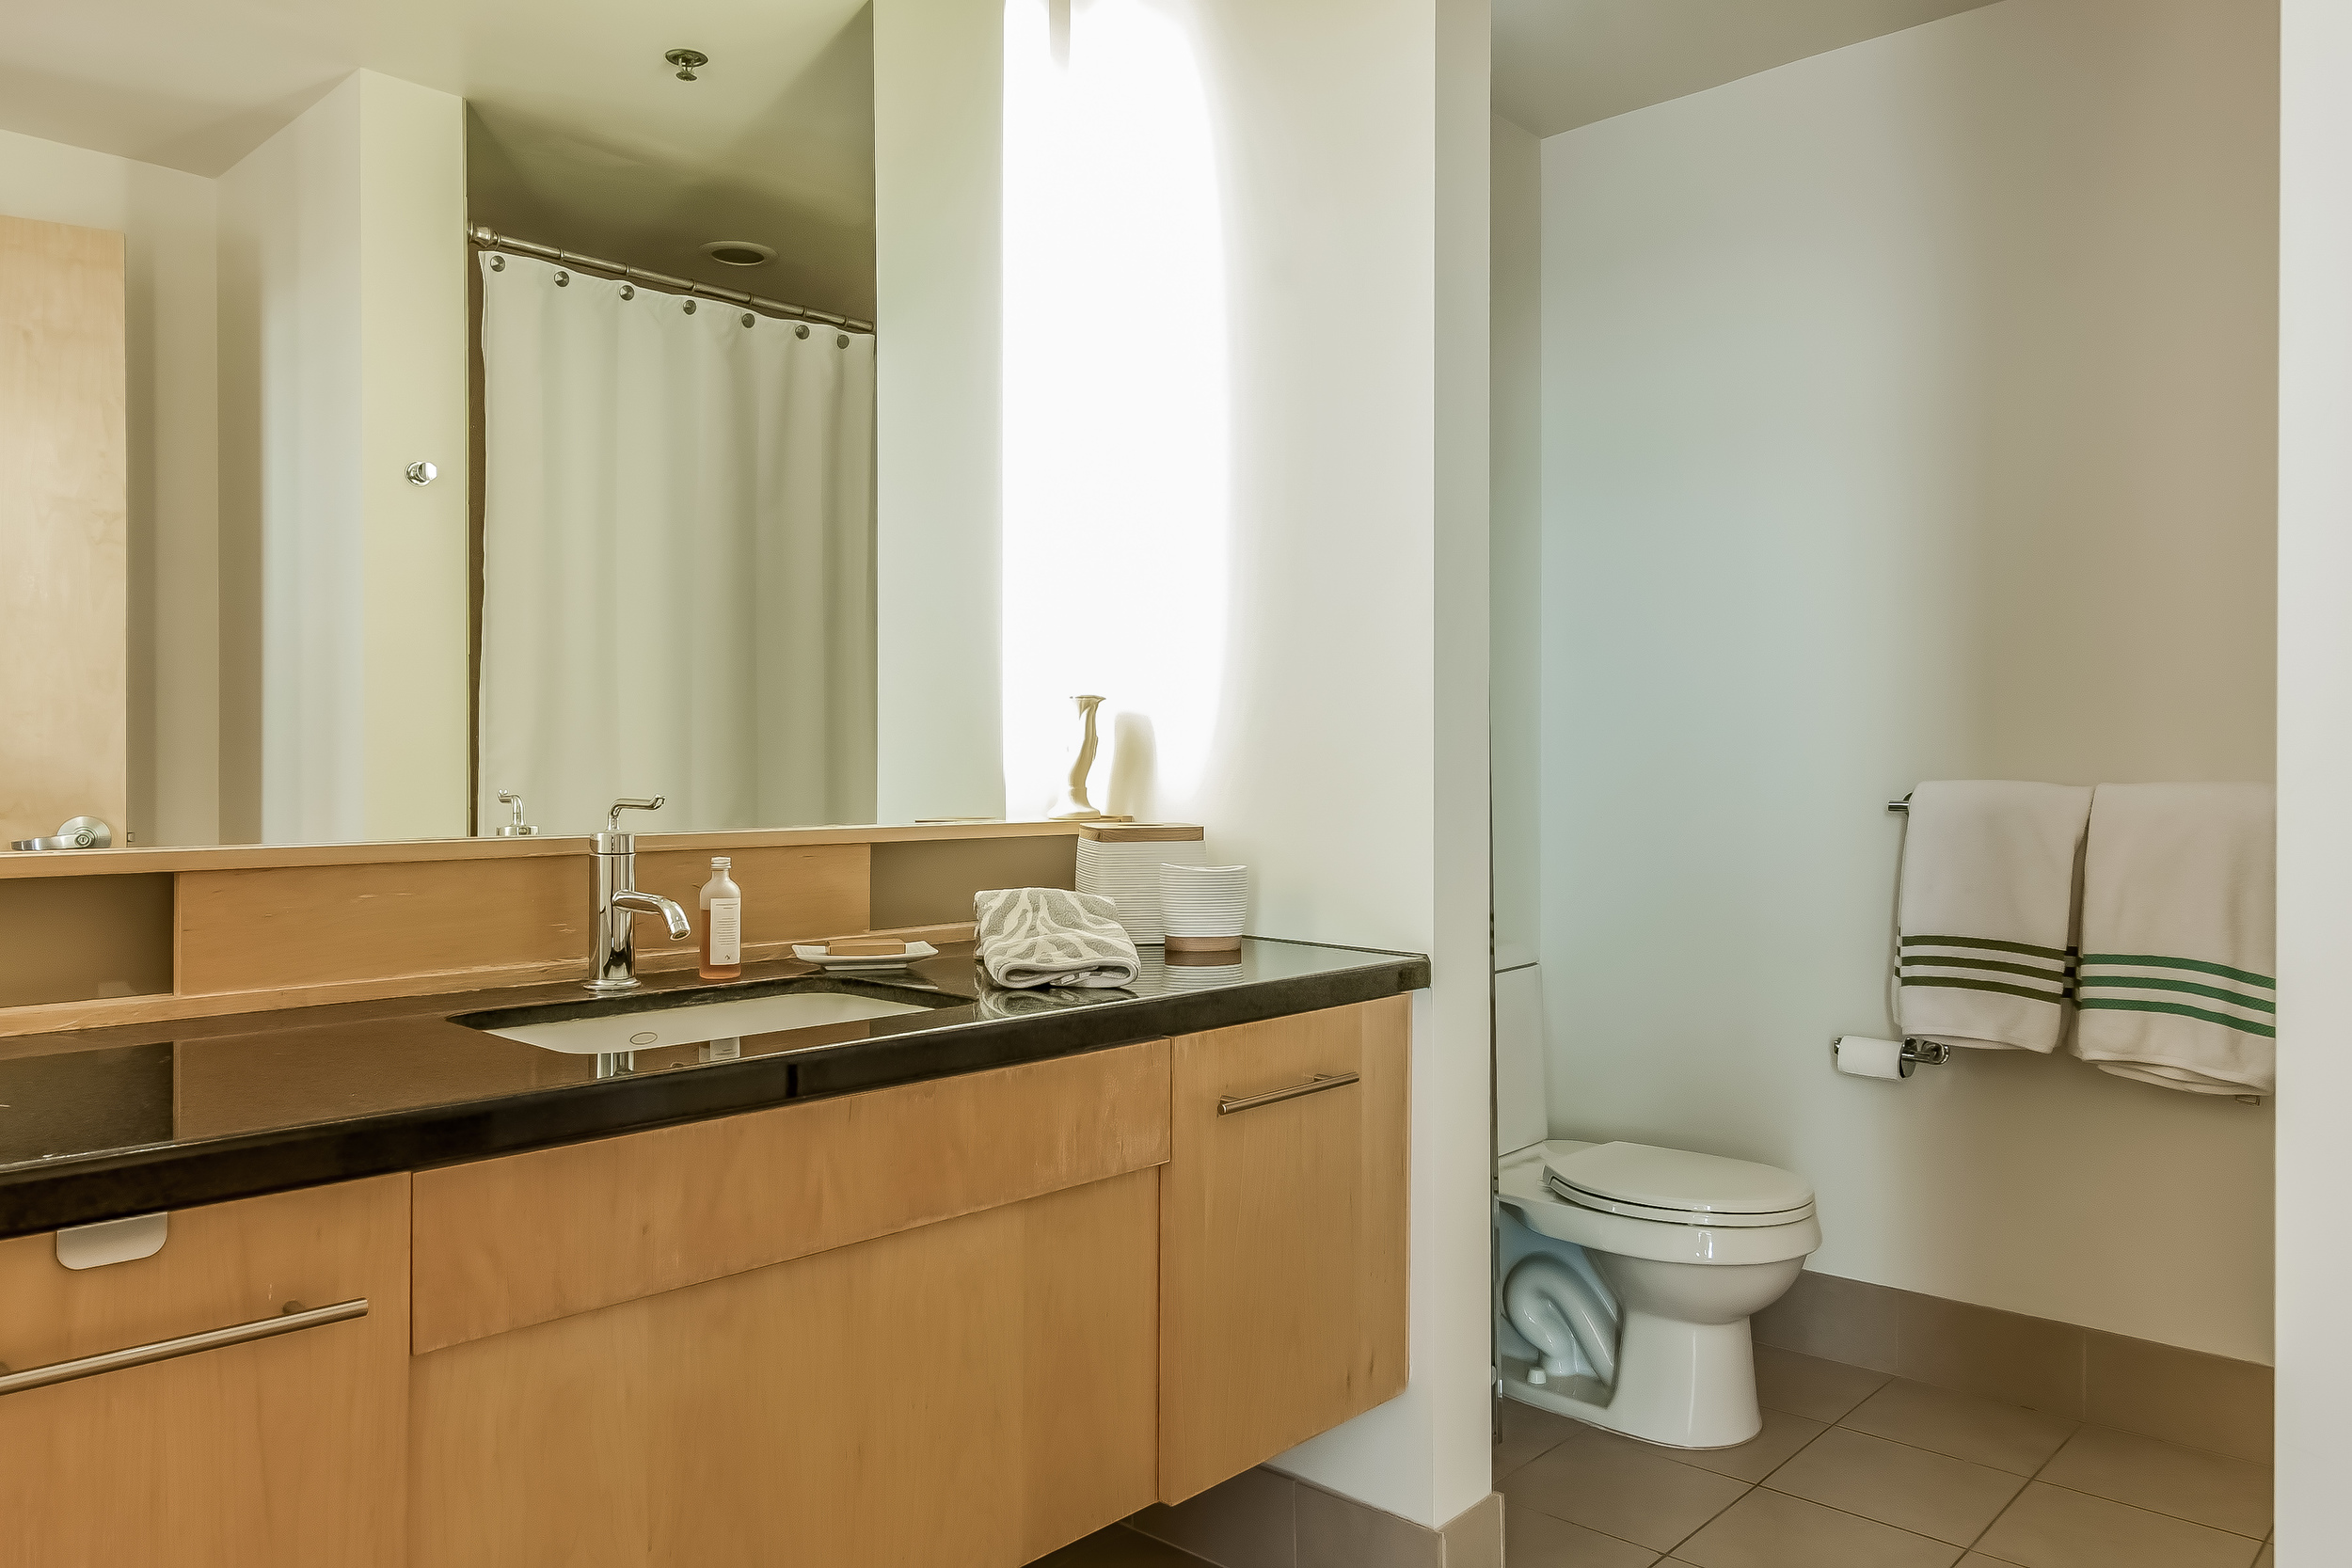 015-Bathroom-910818-large.jpg